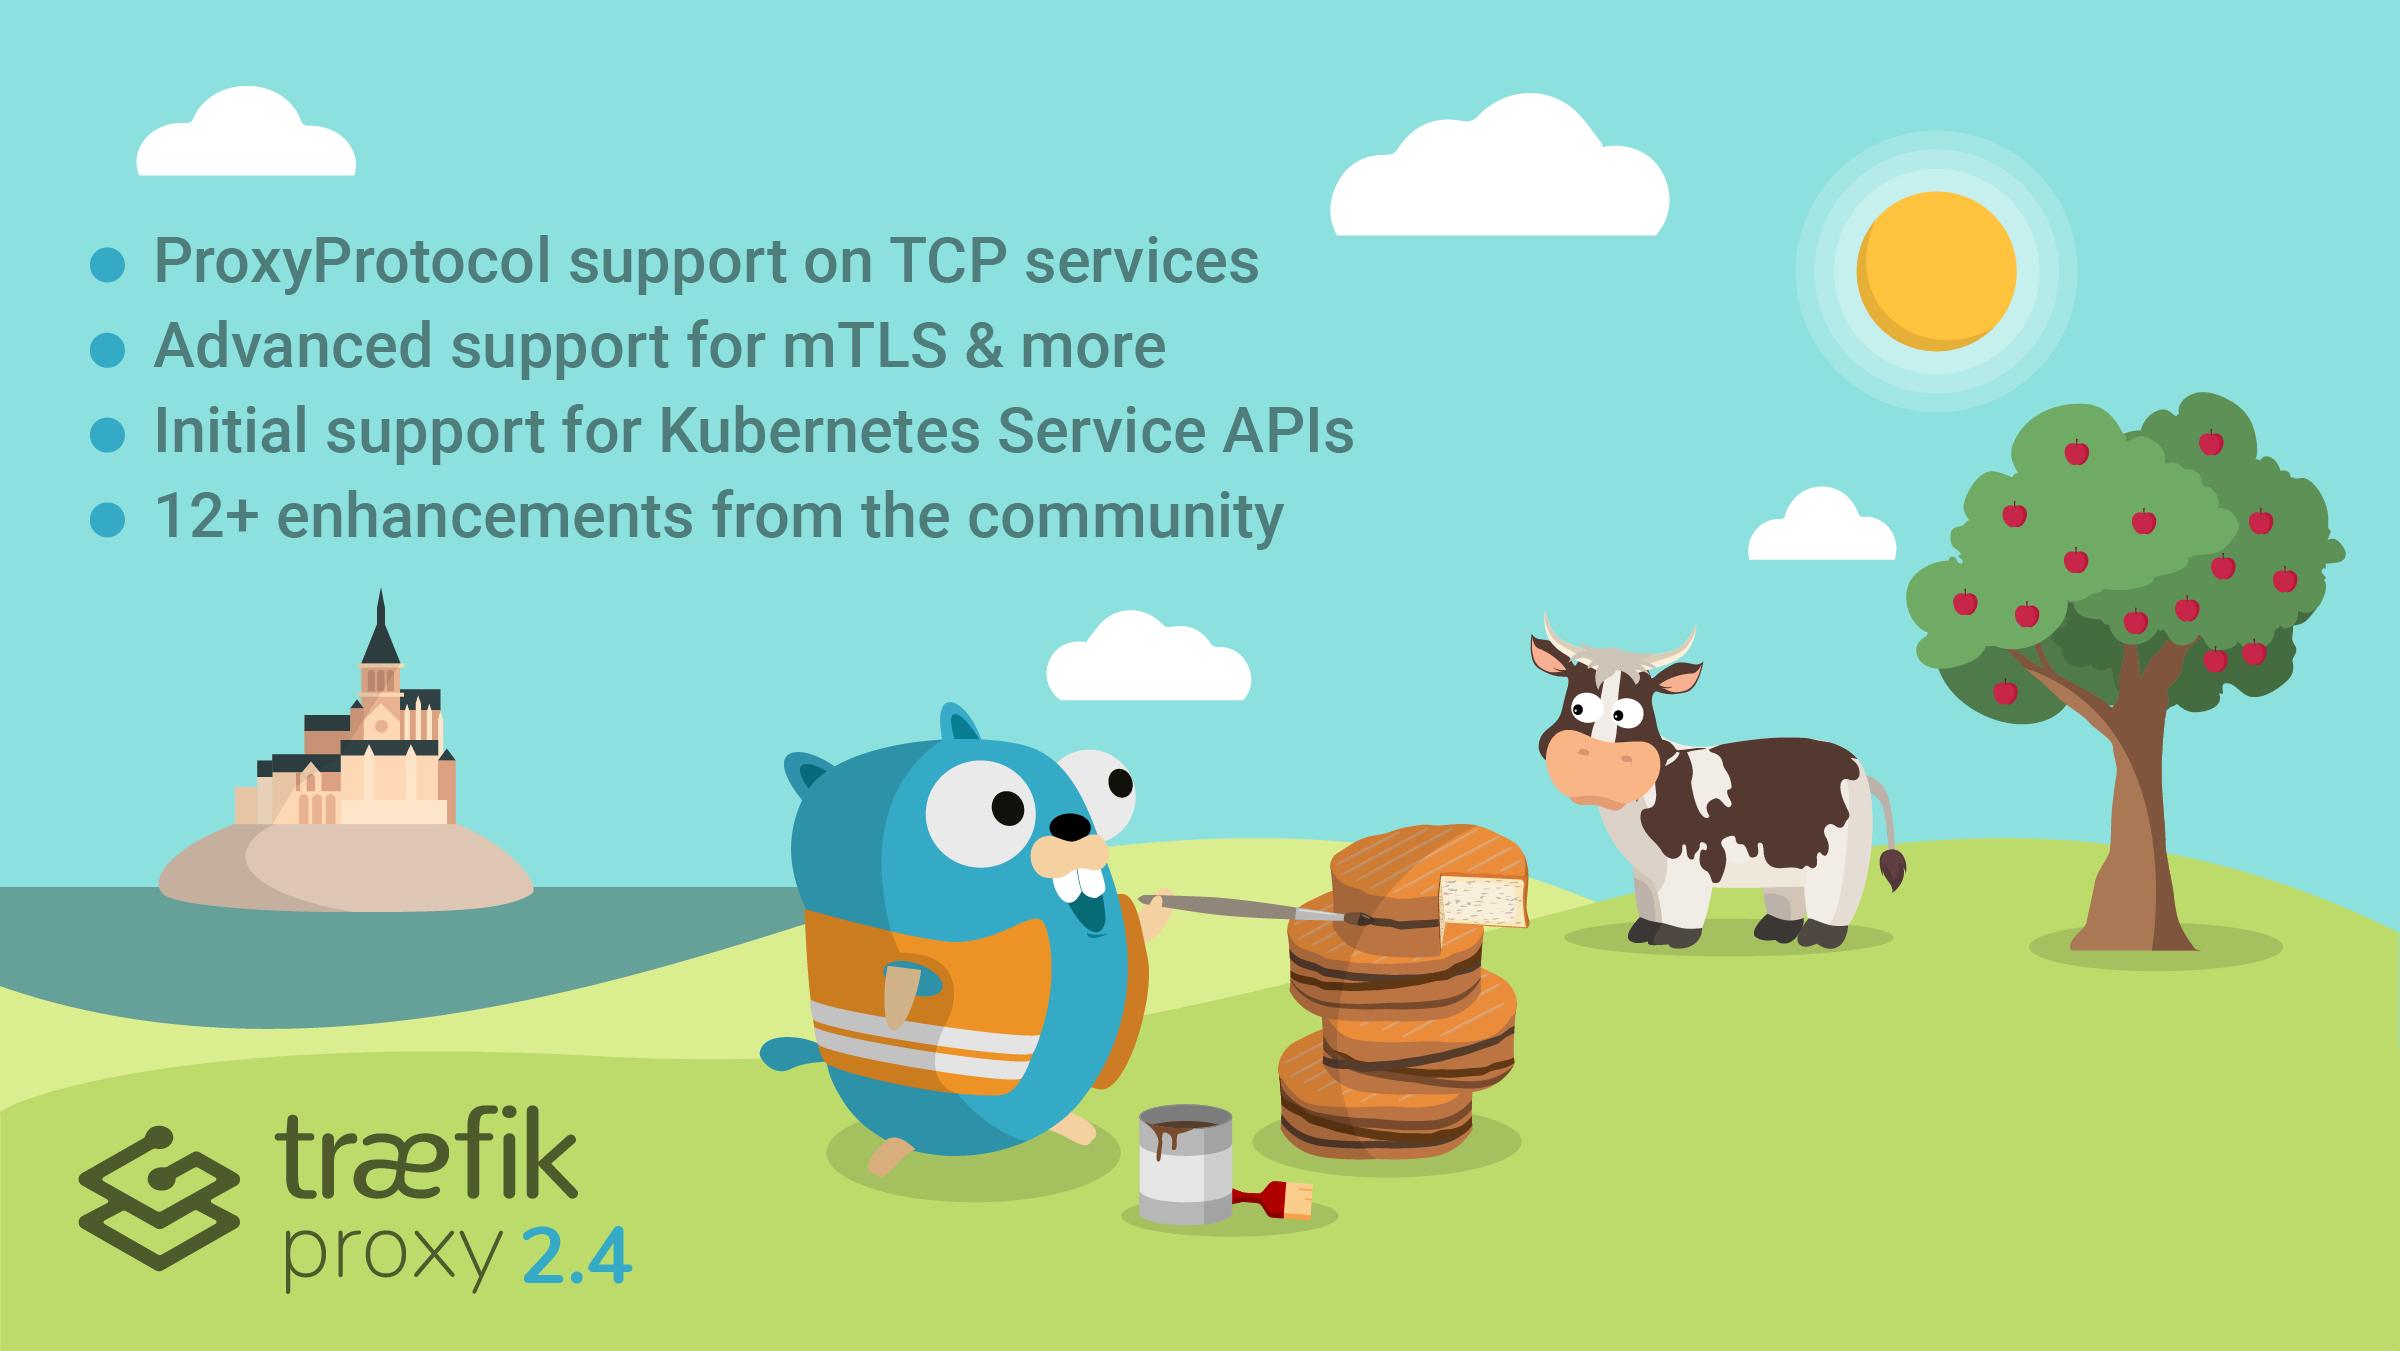 Traefik Proxy 2.4 Adds Advanced mTLS, Kubernetes Service APIs, and More